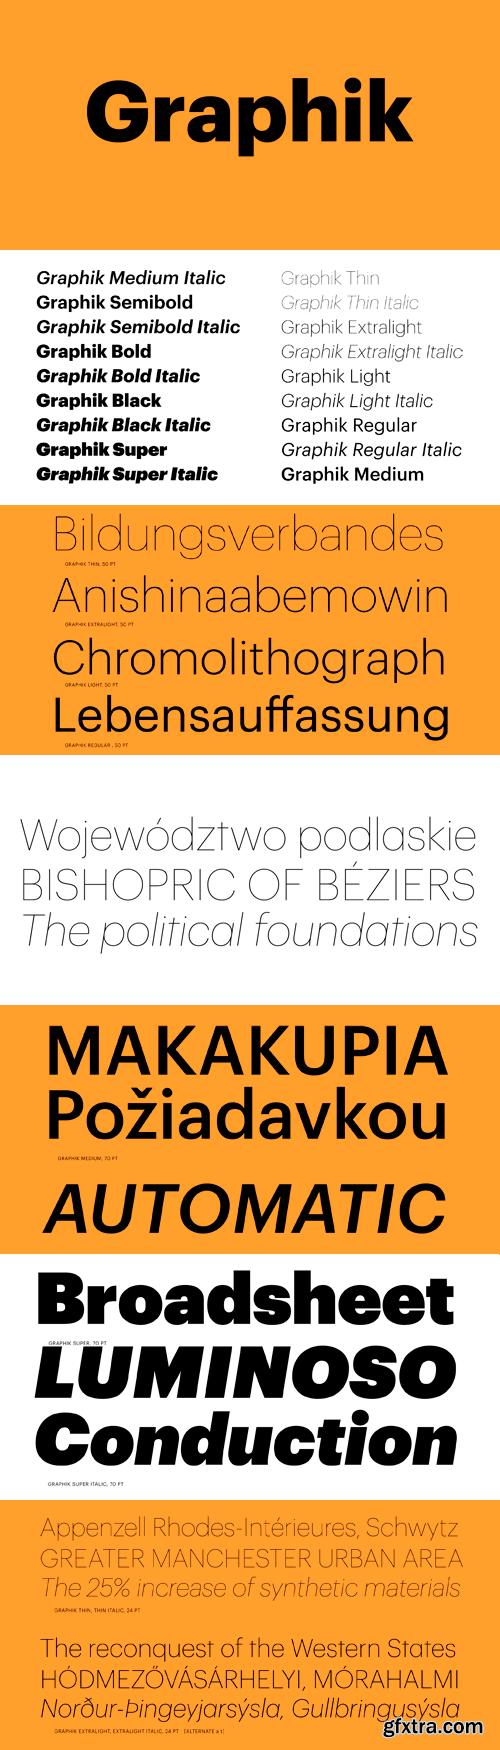 Graphik Font Family - 18 Fonts for $400